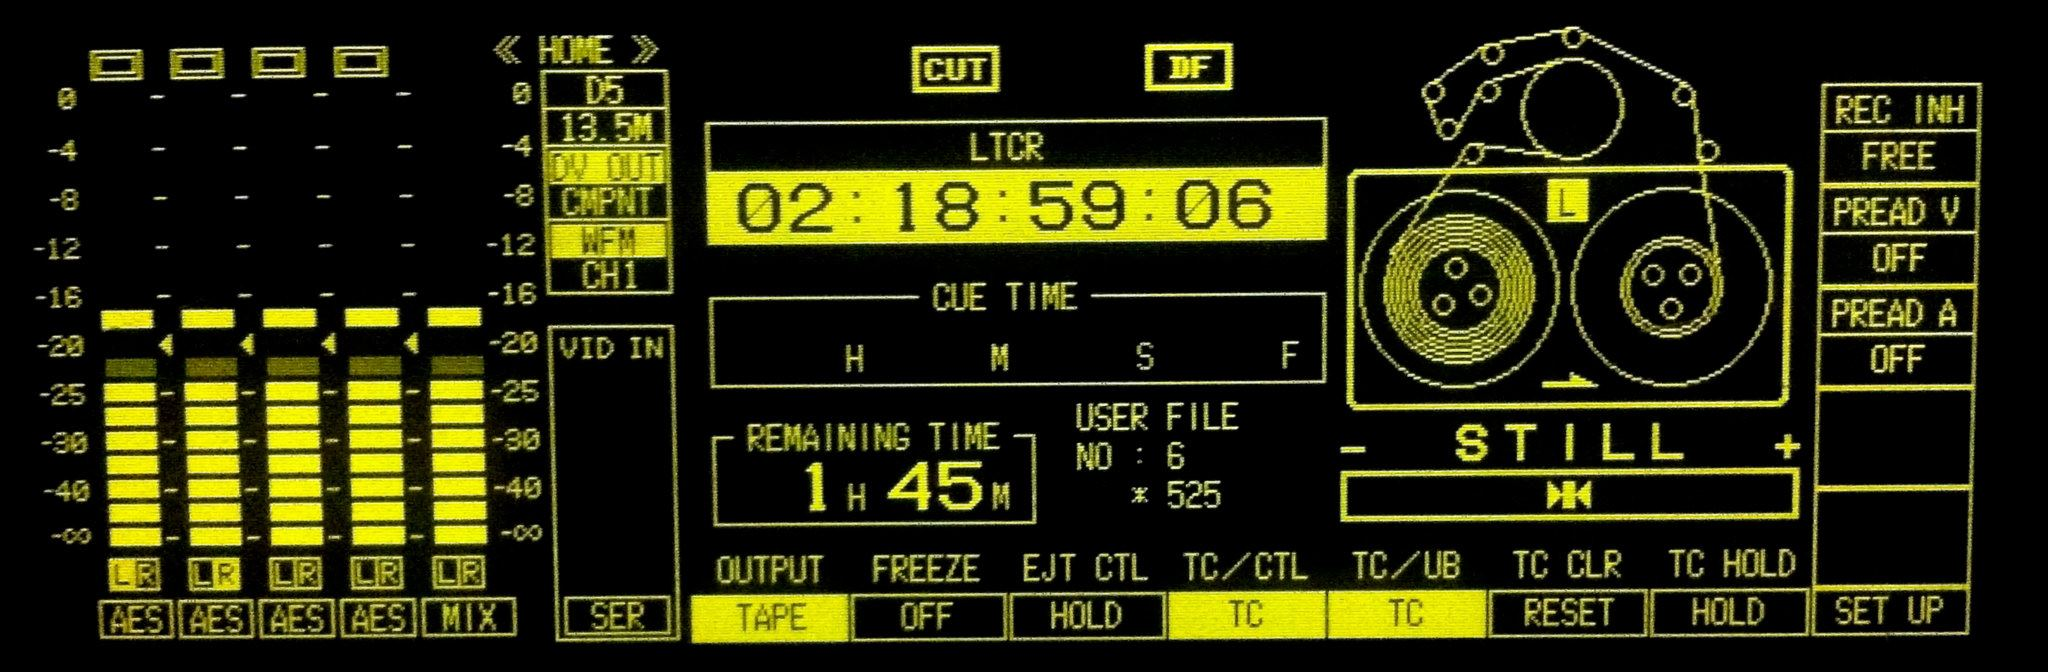 D5 control panel